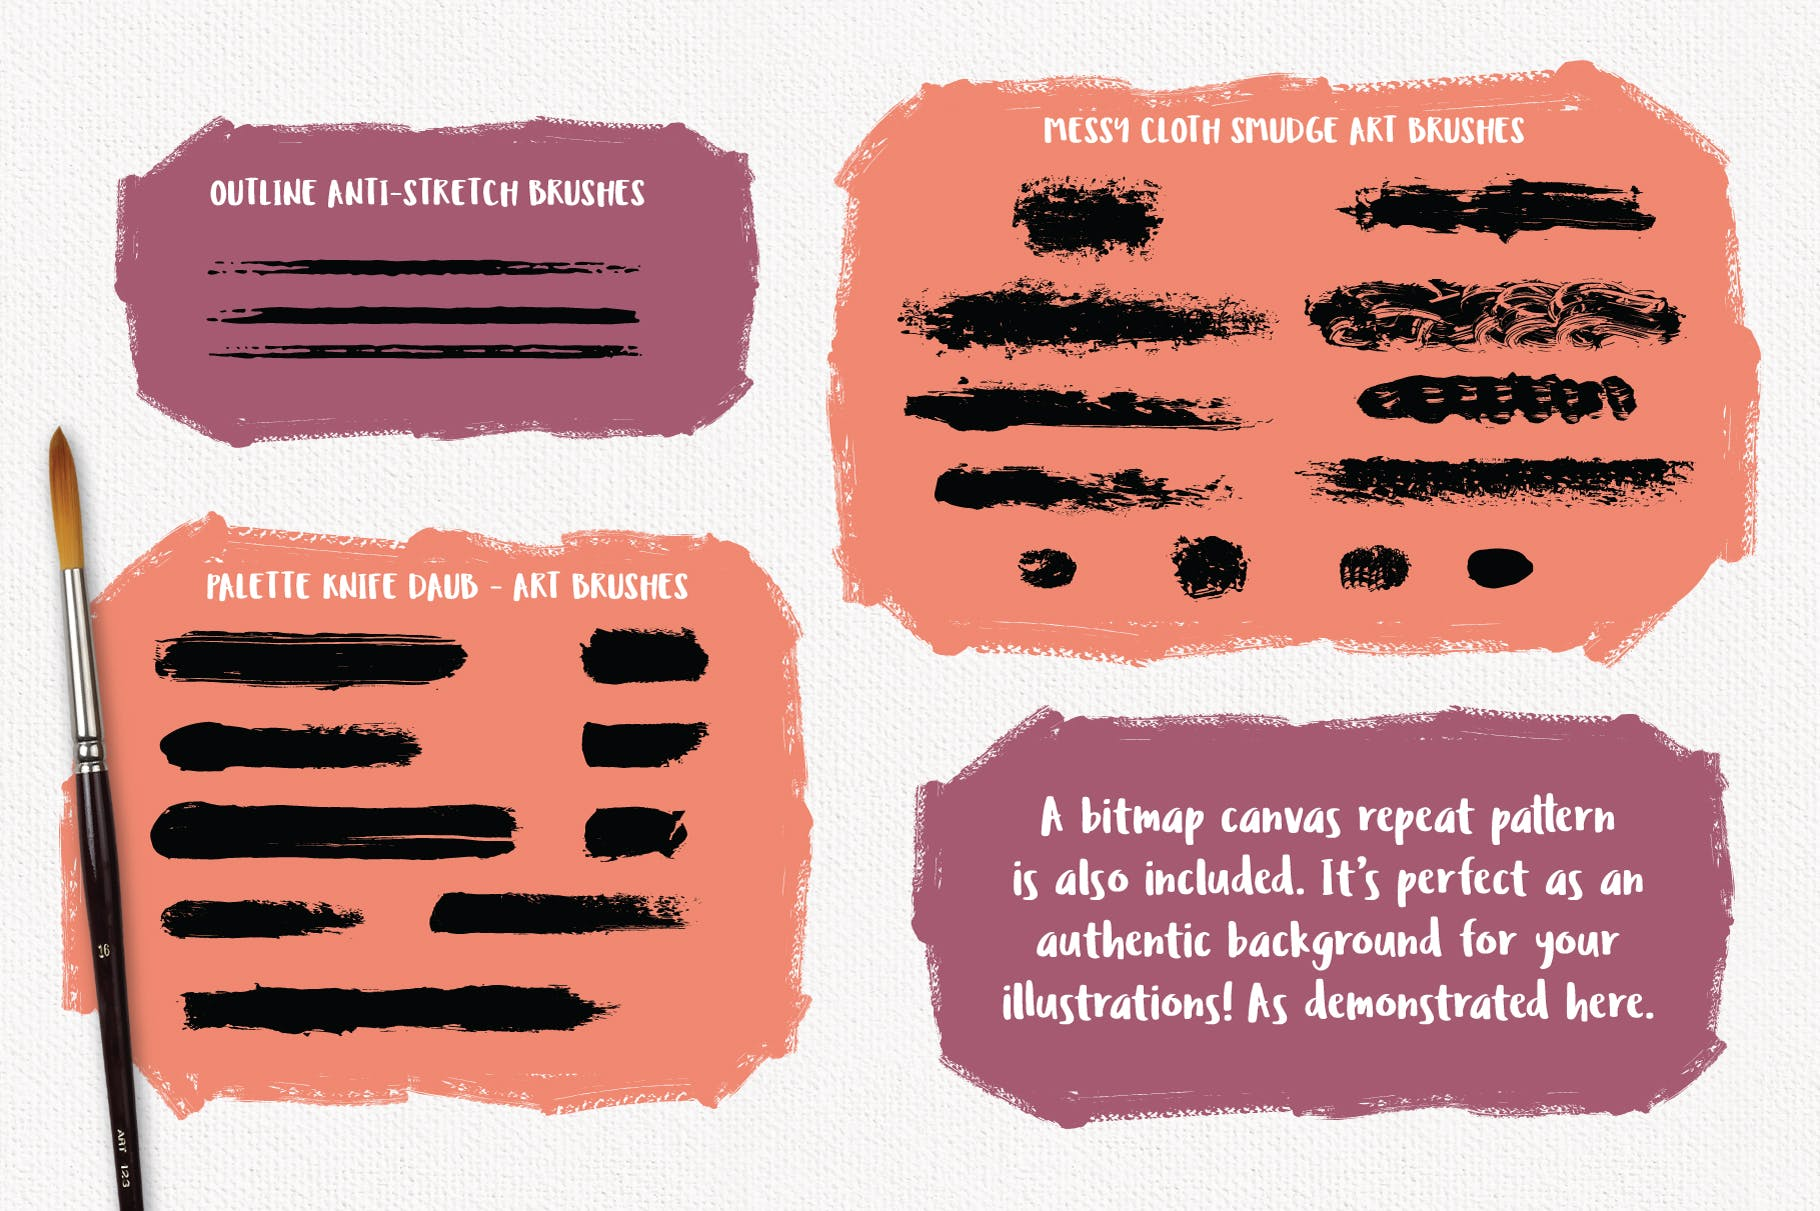 AI油画创作笔刷 Outstanding Oil Paint Brushes设计素材模板